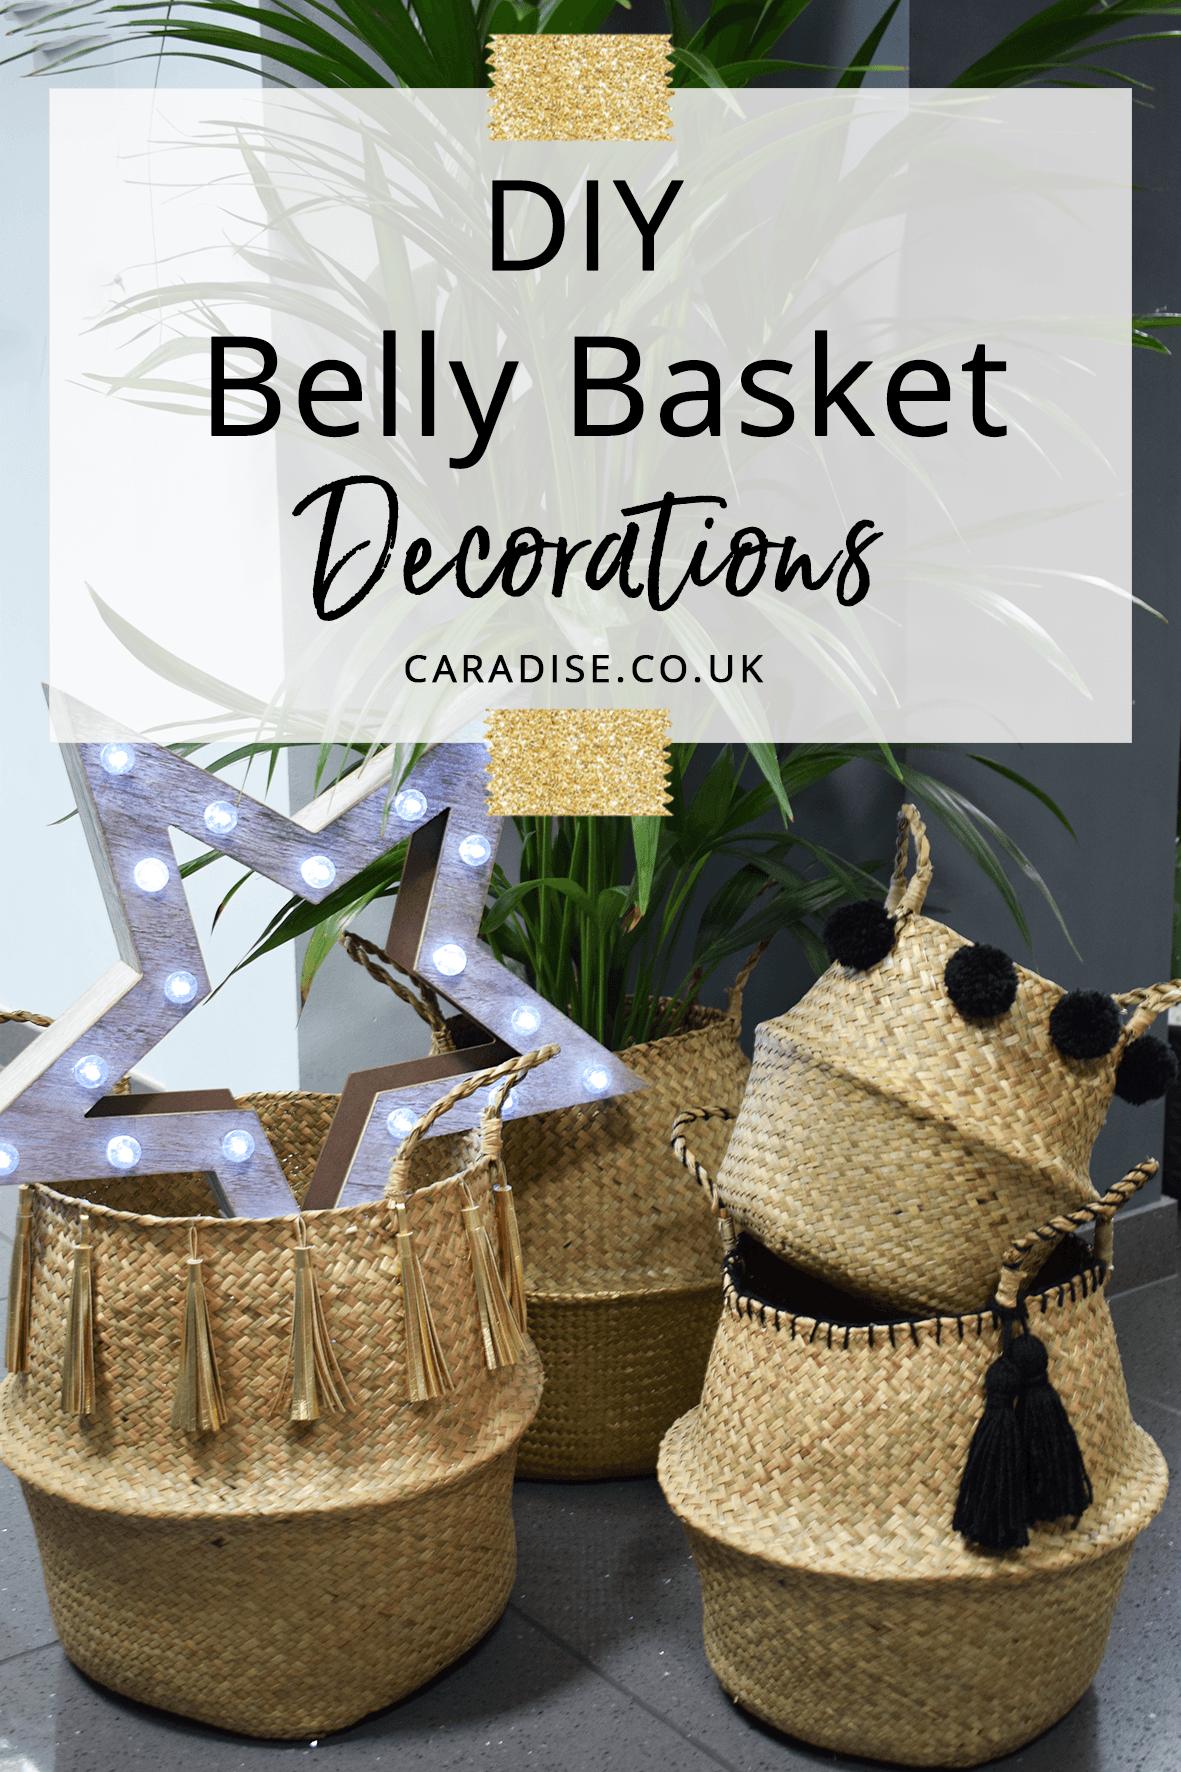 DIY Belly Basket Decorations